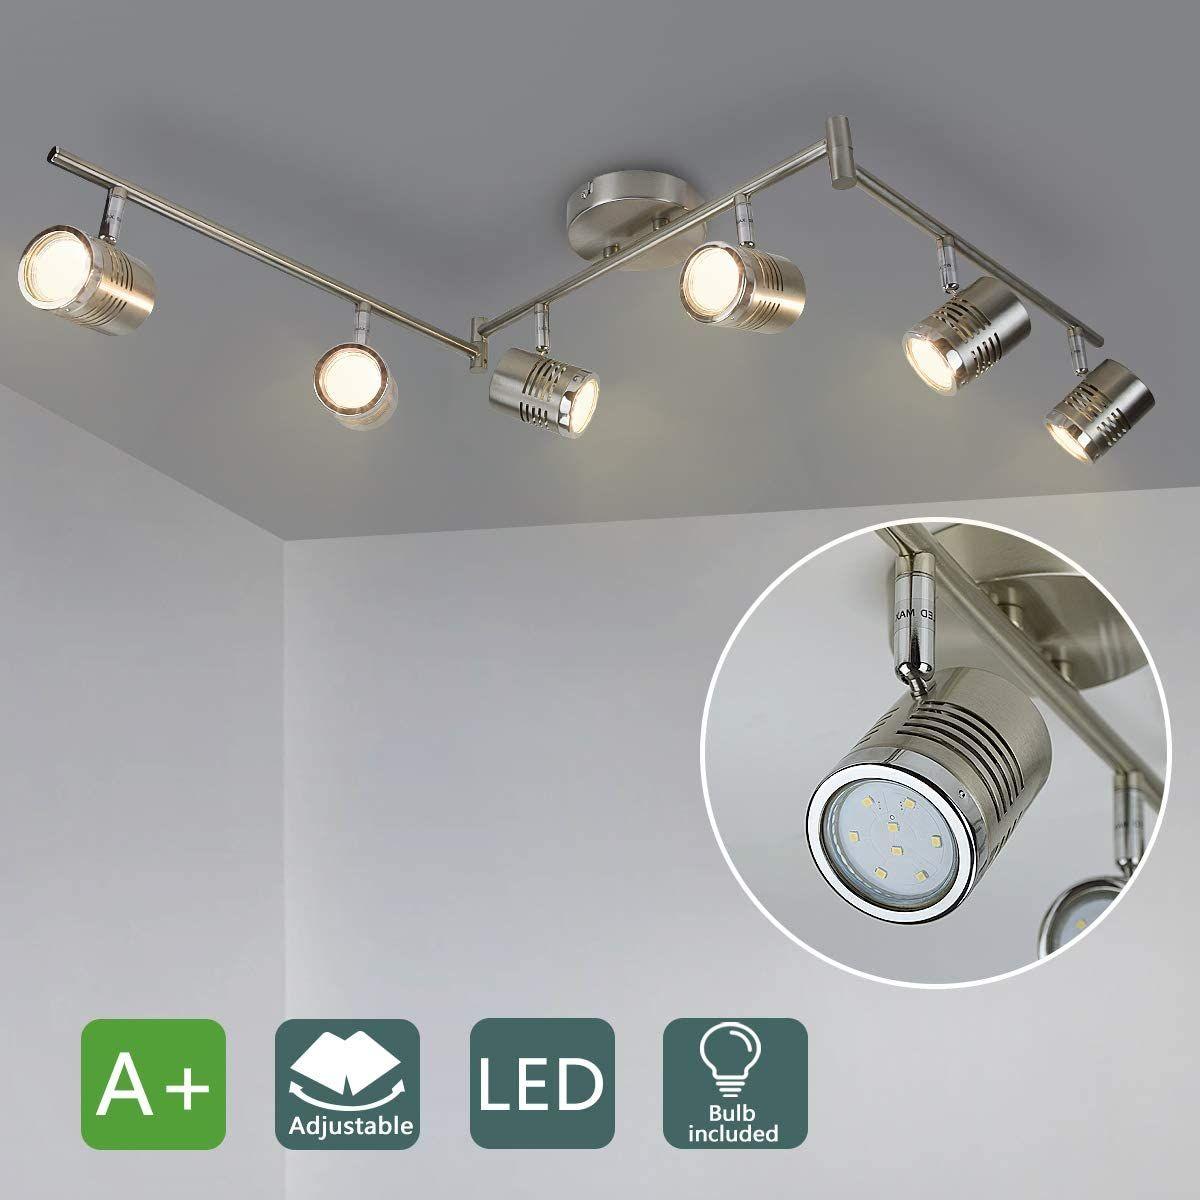 Dollinger 4 Light Semi Flush Mount Kitchen Lighting Fixtures Ceiling Industrial Kitchen Lighting Track Lighting Kitchen